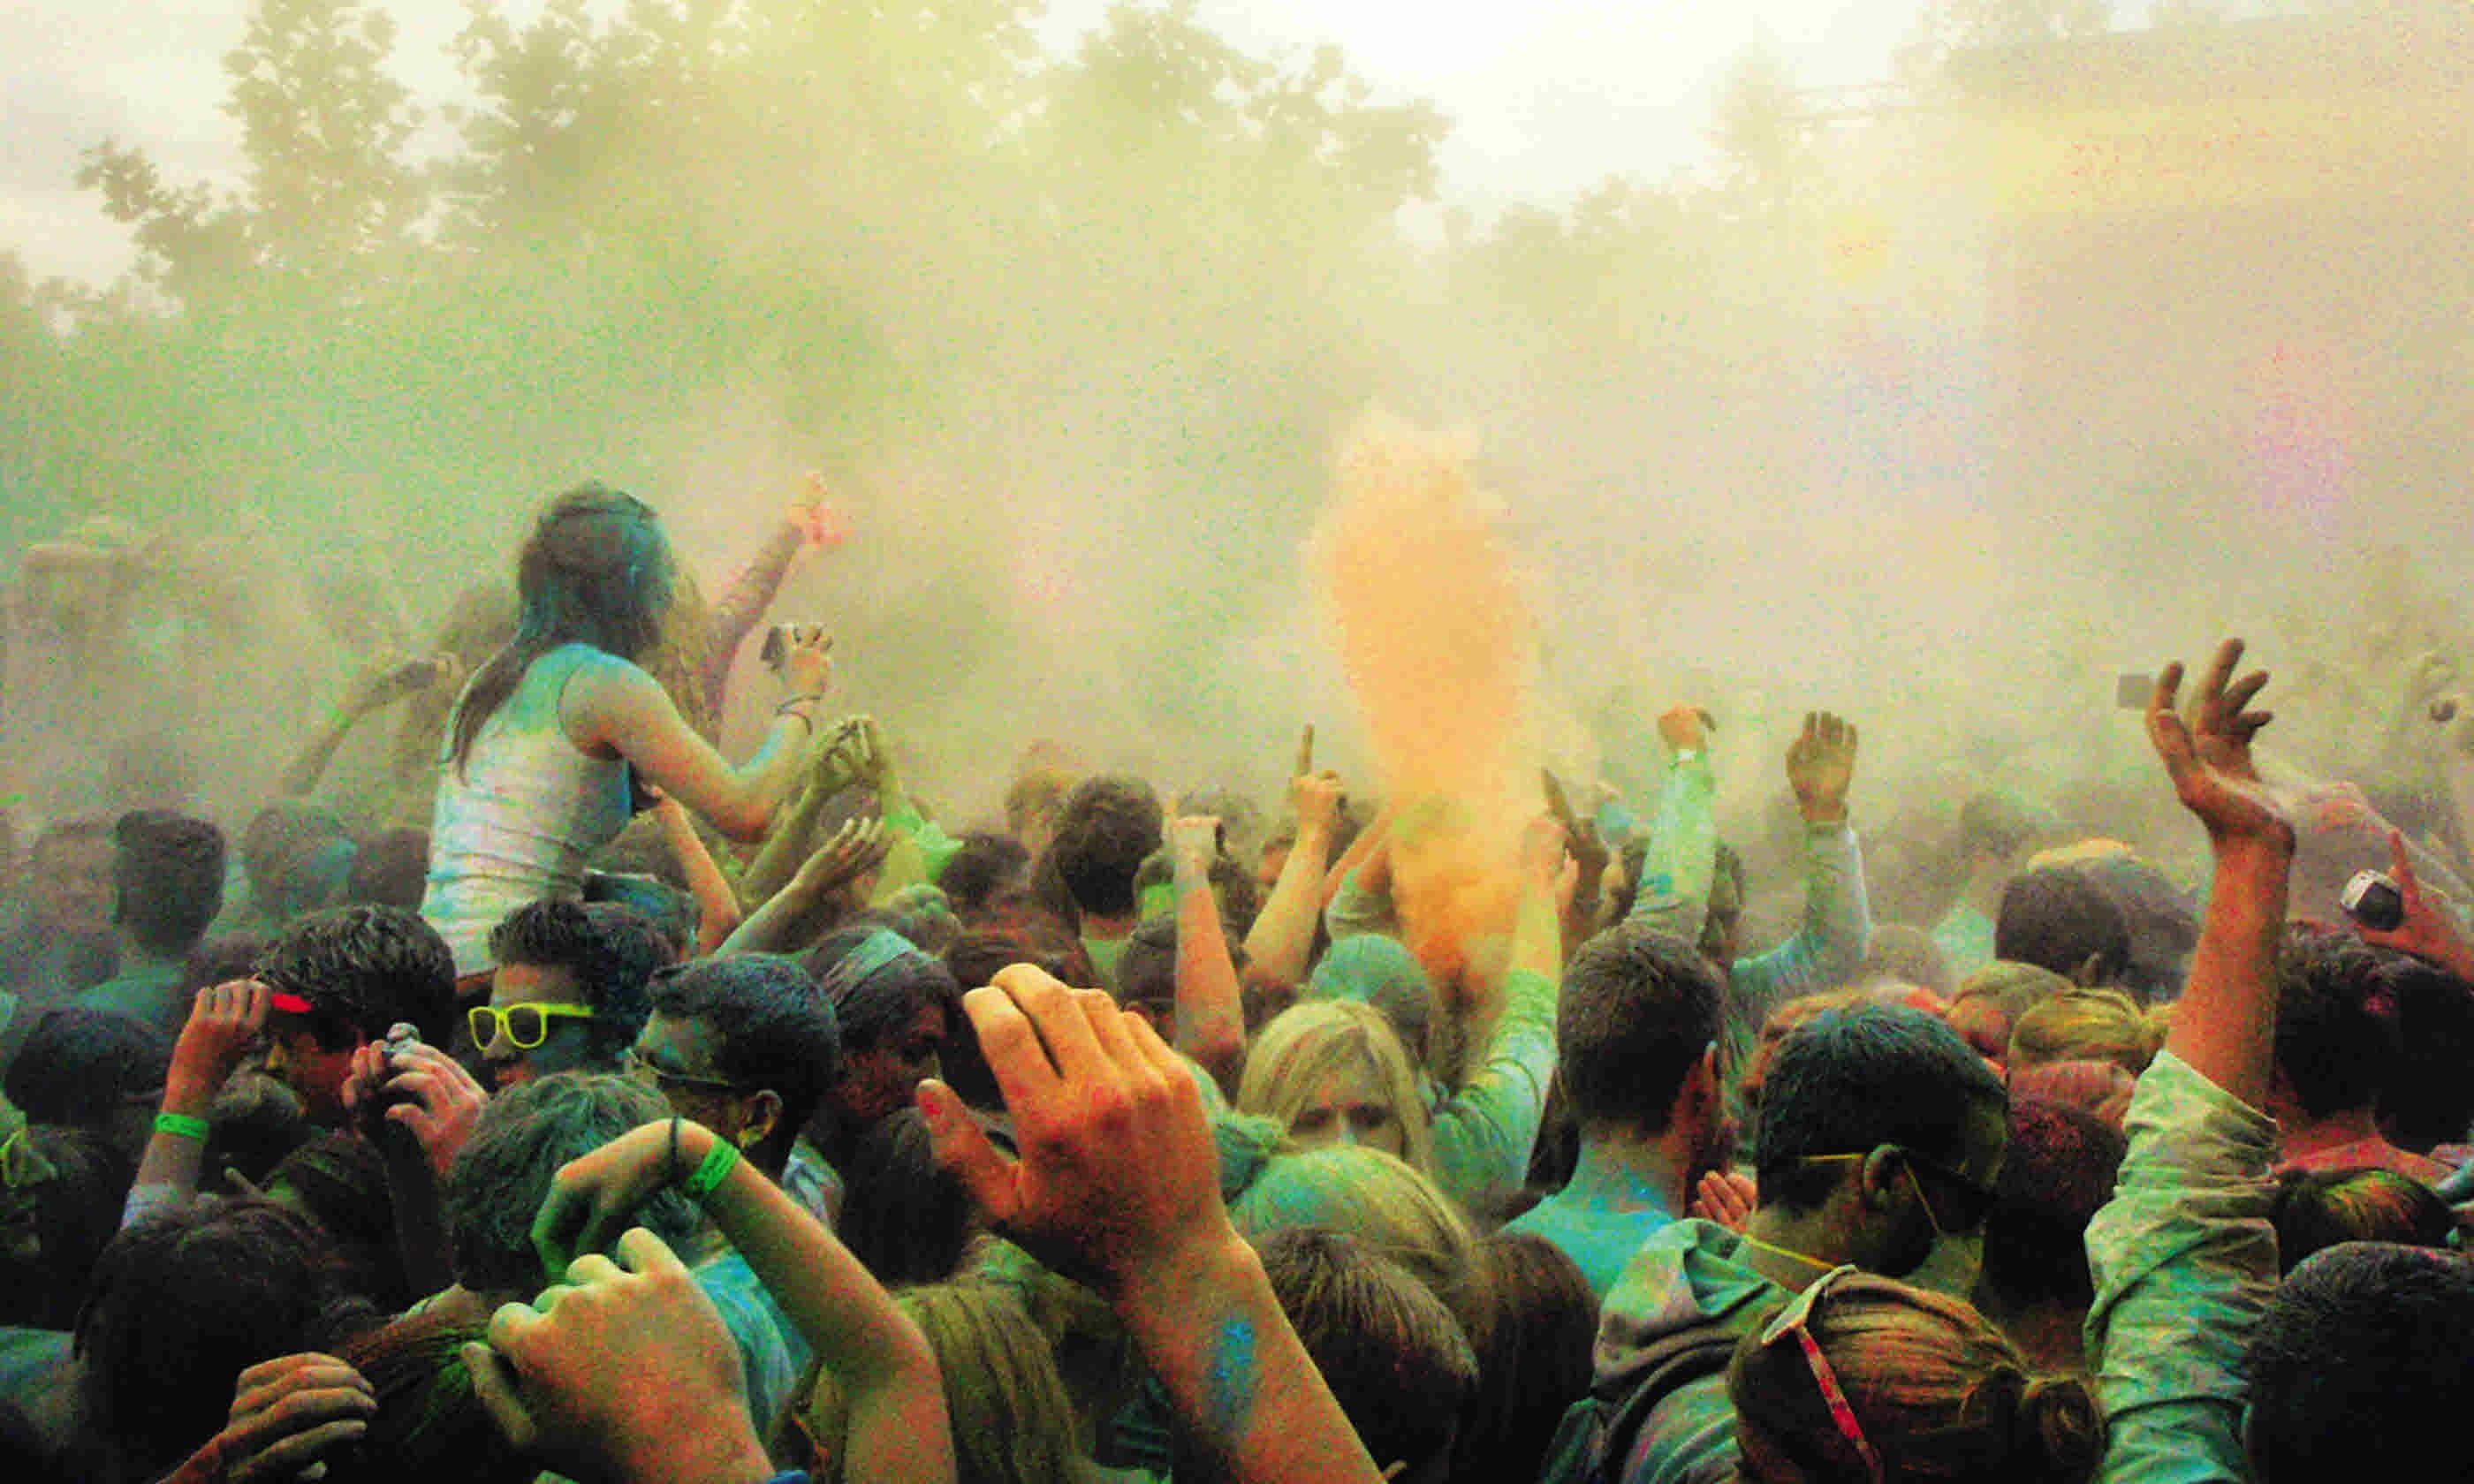 Crowd celebrating Holi Festival